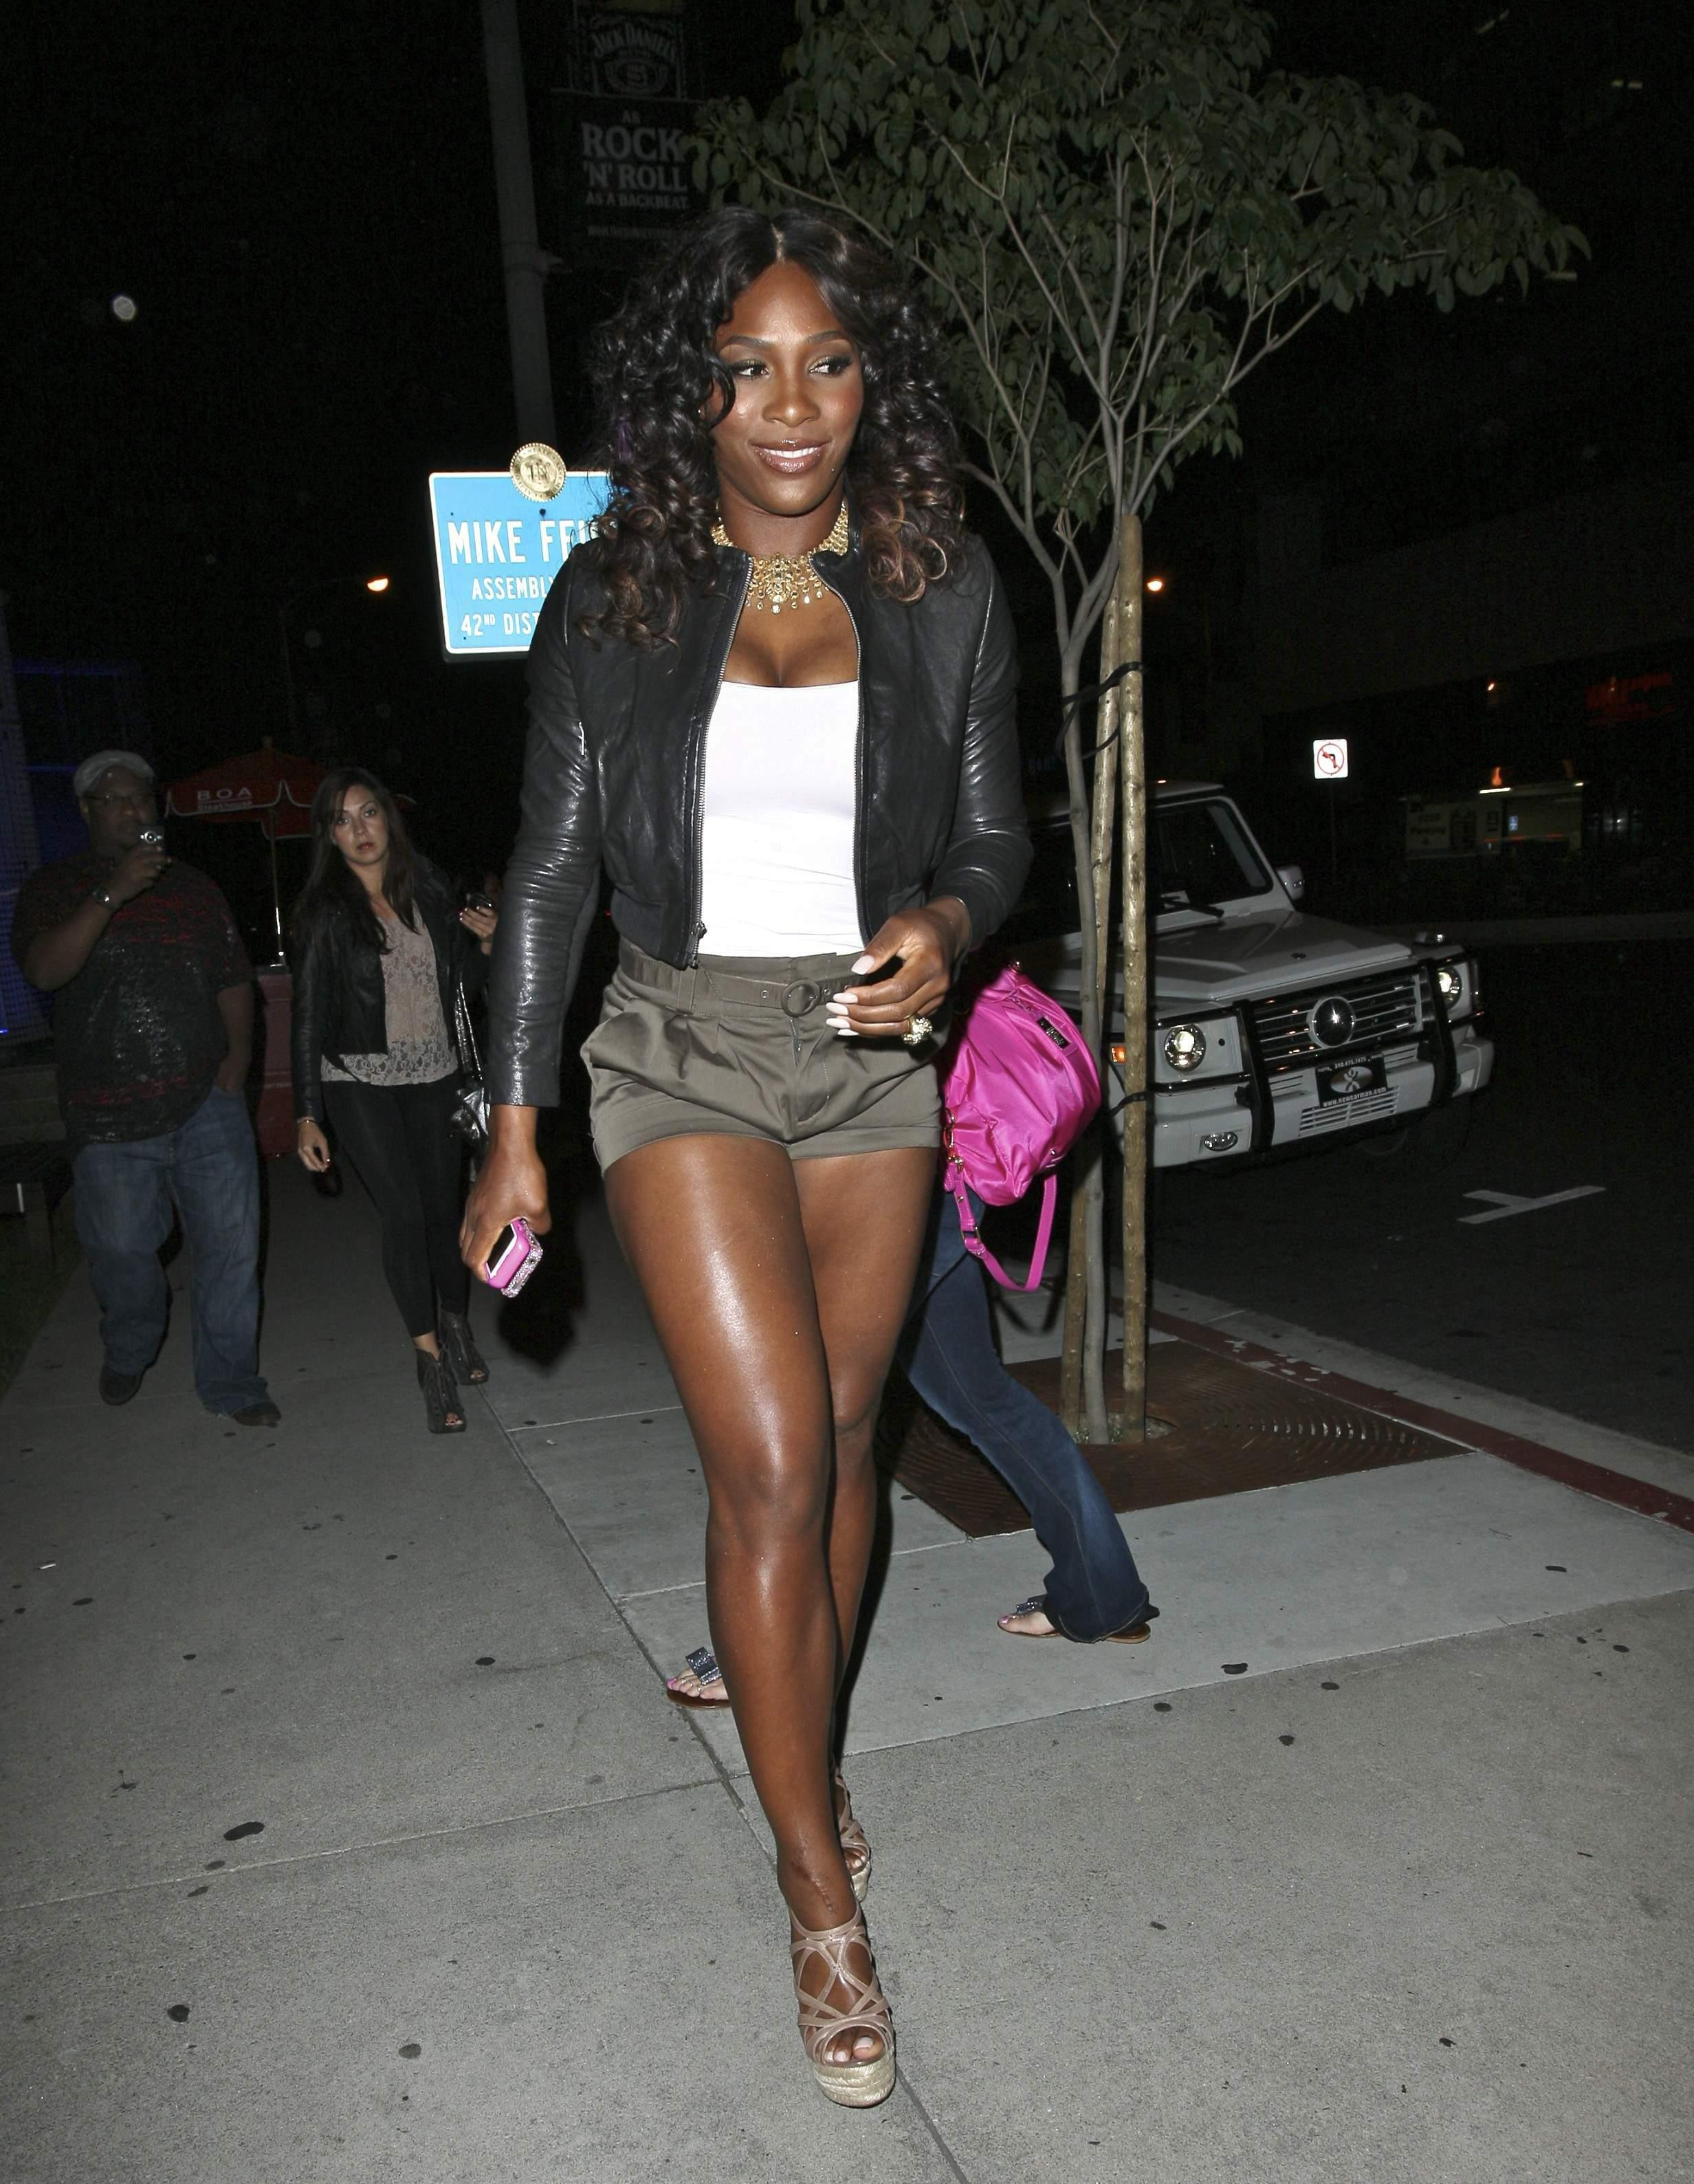 Serena Williams BoaSteakhouseJuly13201115_123_101lo.jpg